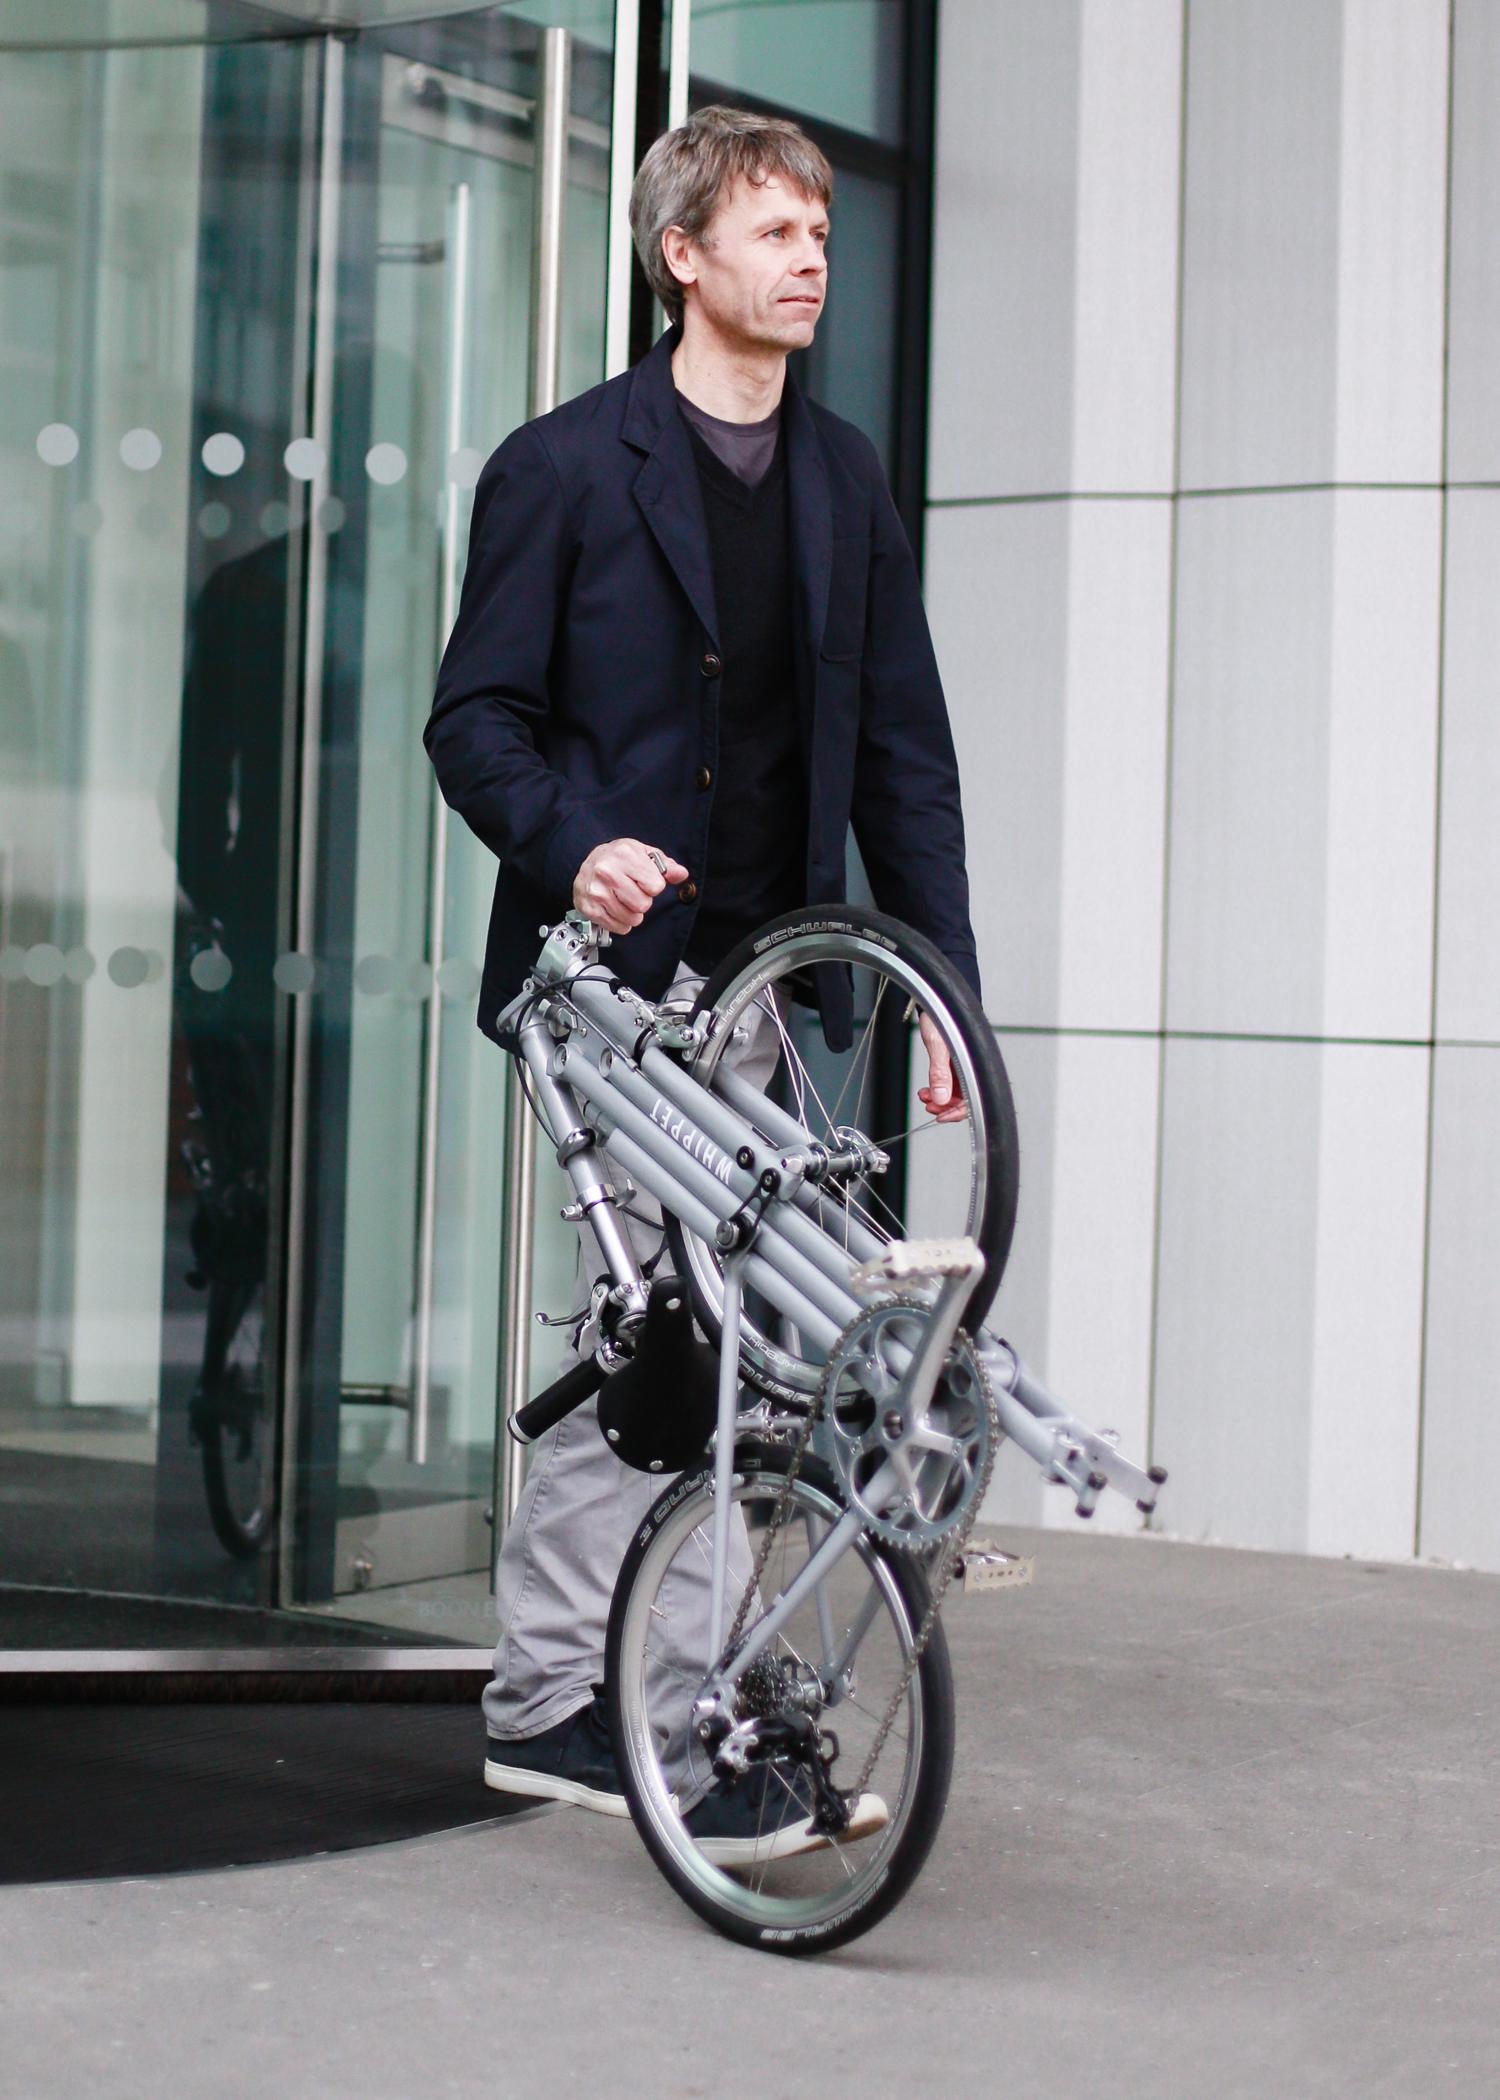 Whippet Bicycle - wheeling along